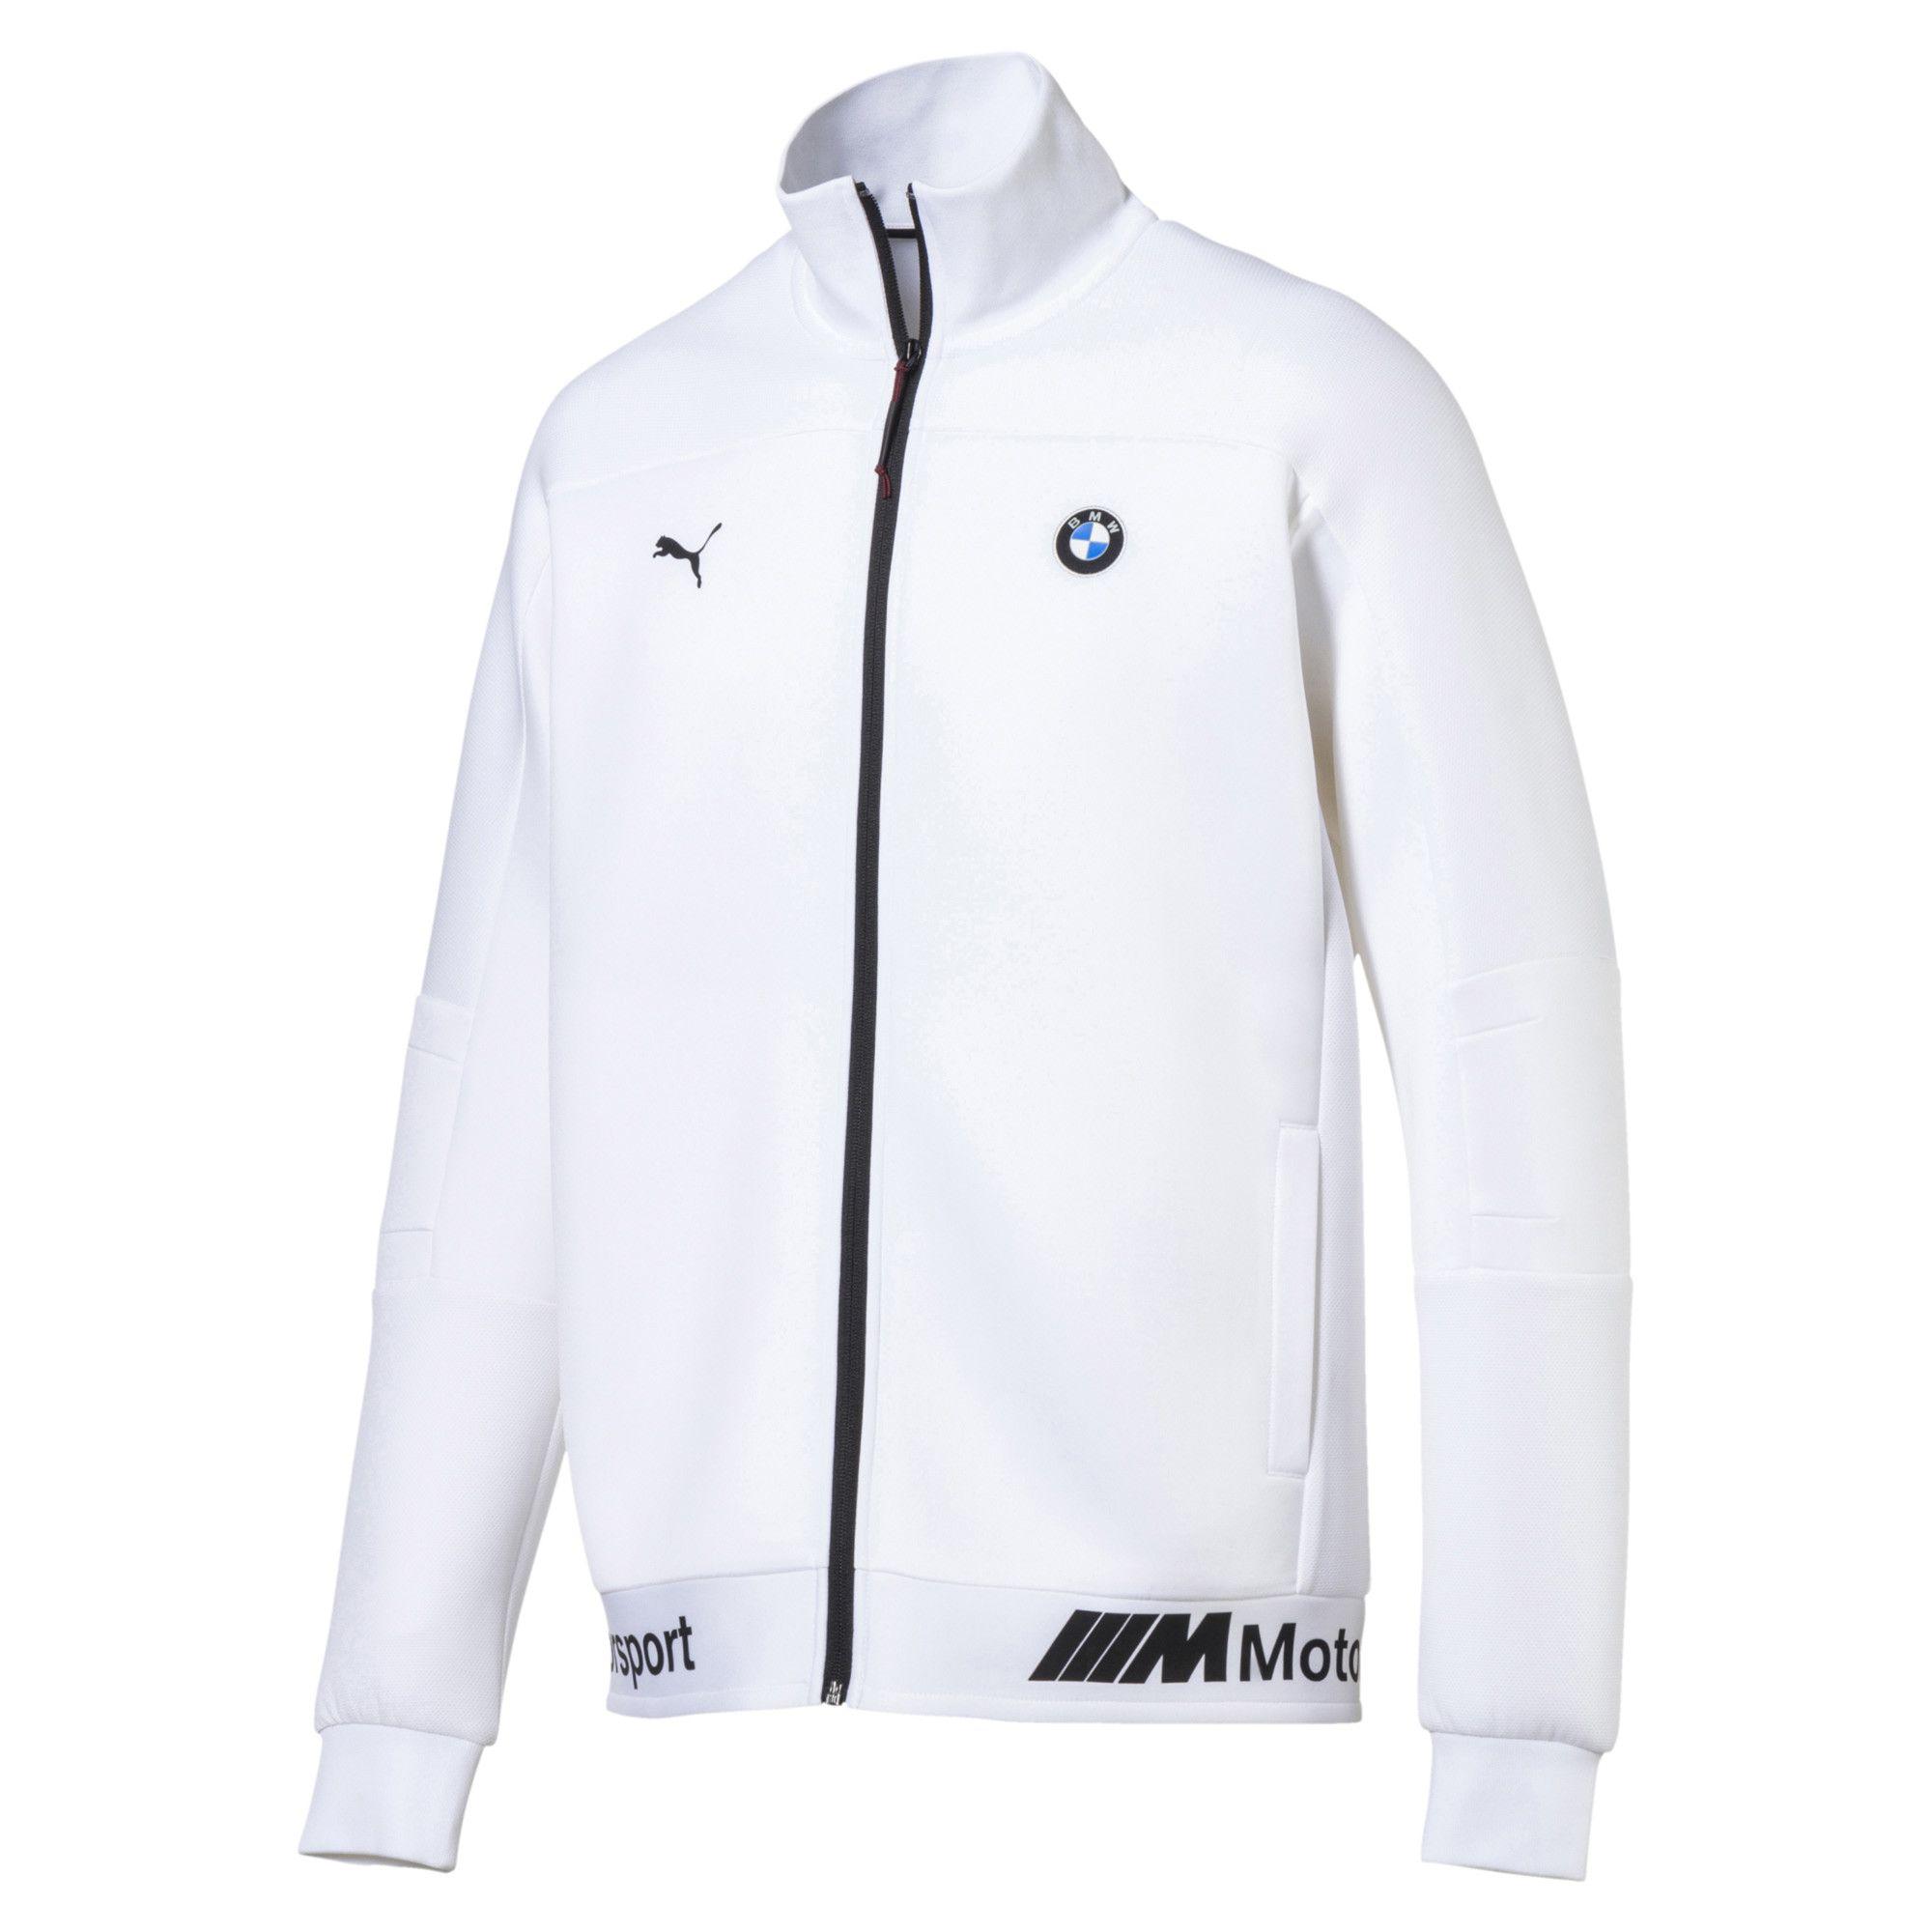 Bmw M Motorsport Life Men S Sweat Jacket Puma Us Mens Outdoor Jackets Mens Jackets Mens Outfits [ 2000 x 2000 Pixel ]